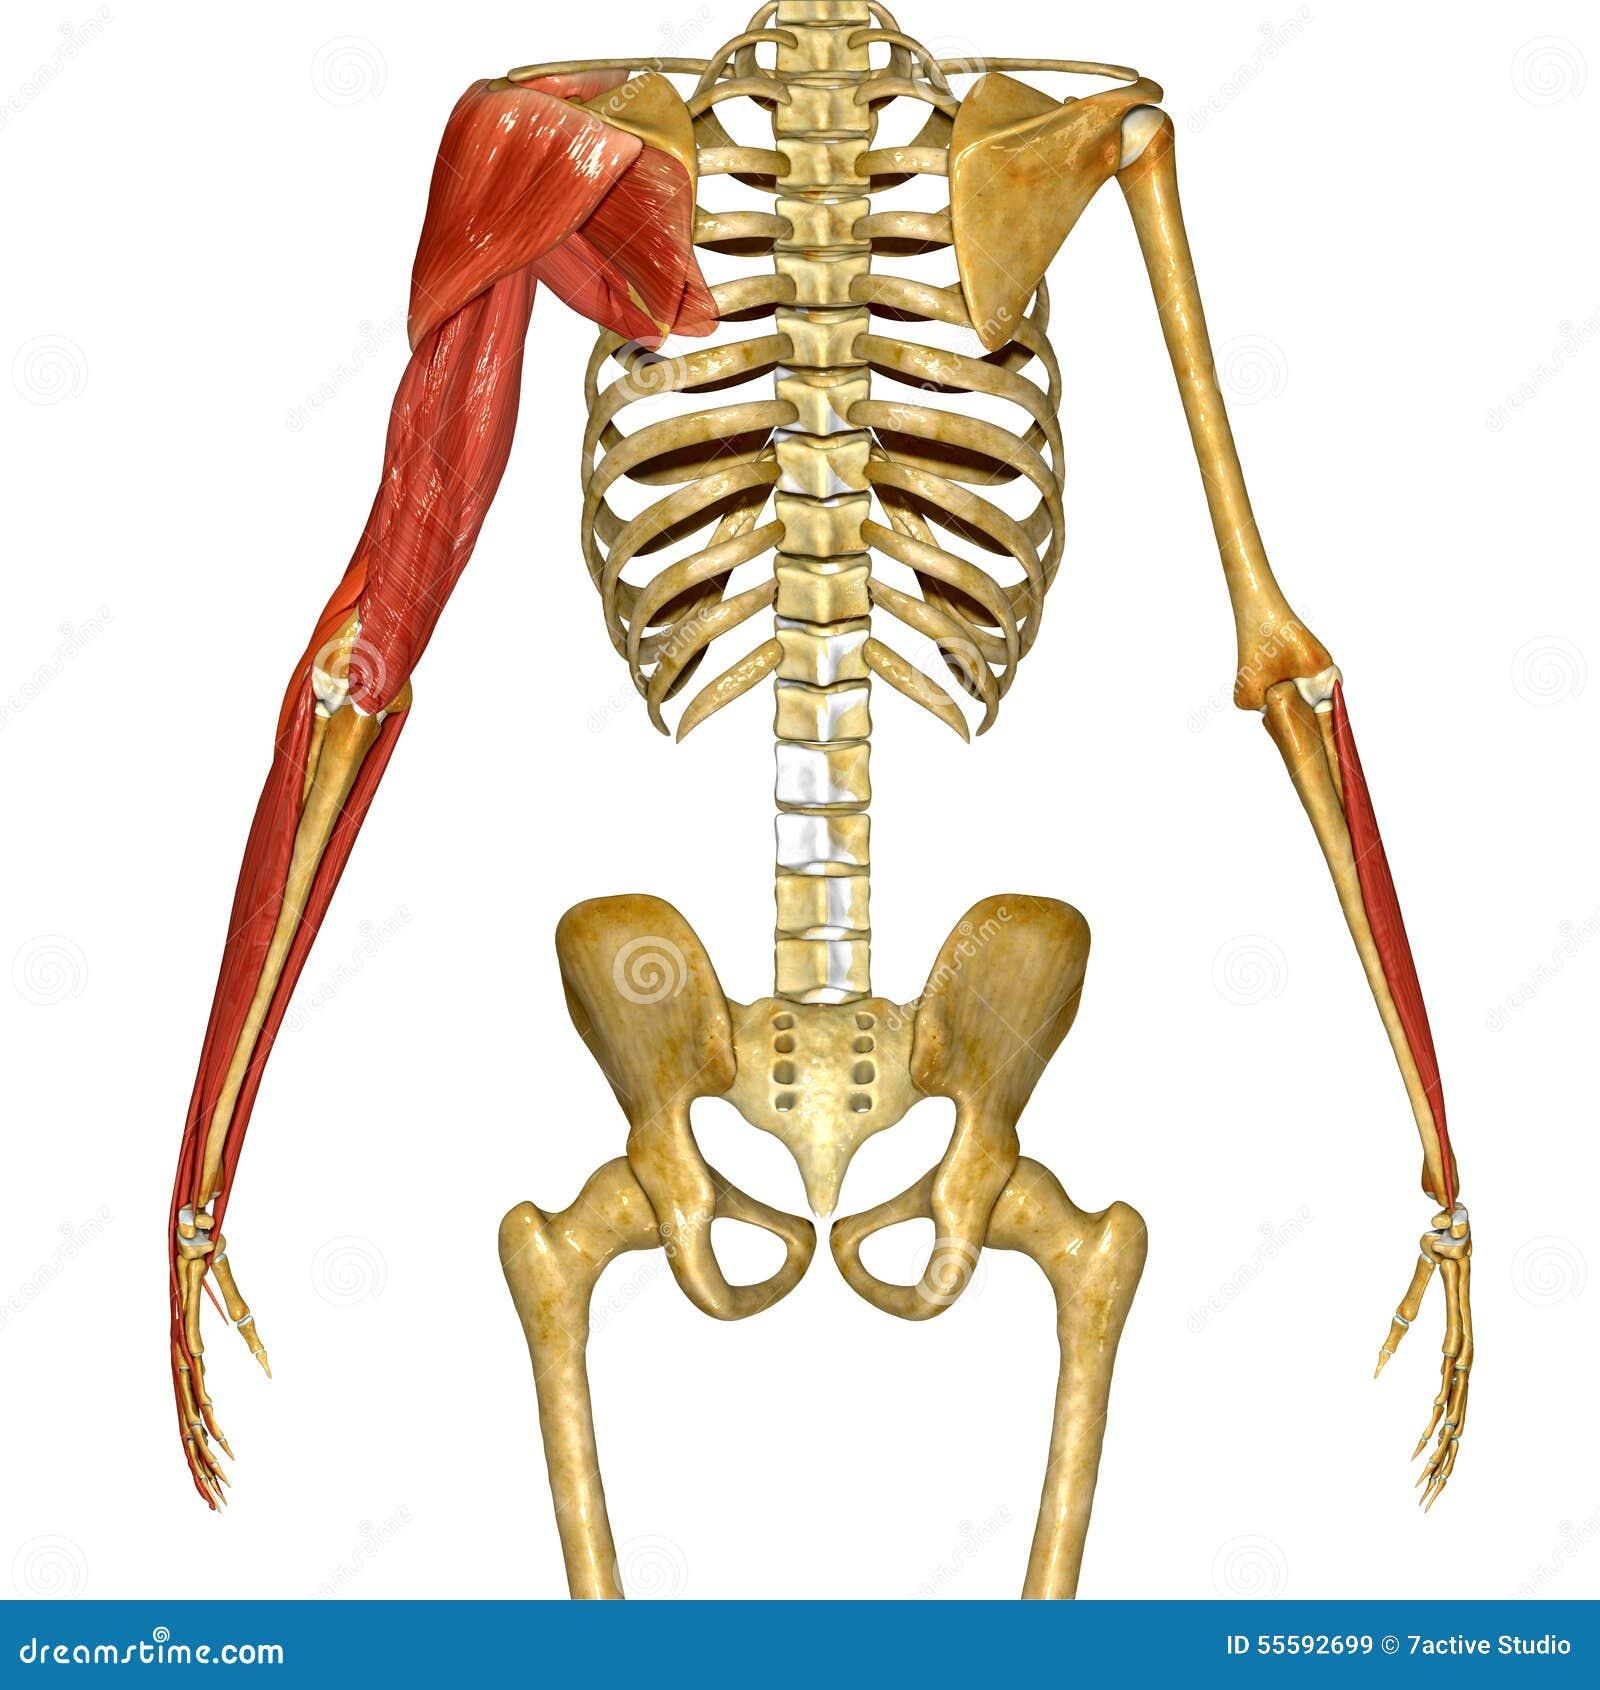 Shoulder Muscles stock illustration. Illustration of body - 55592699